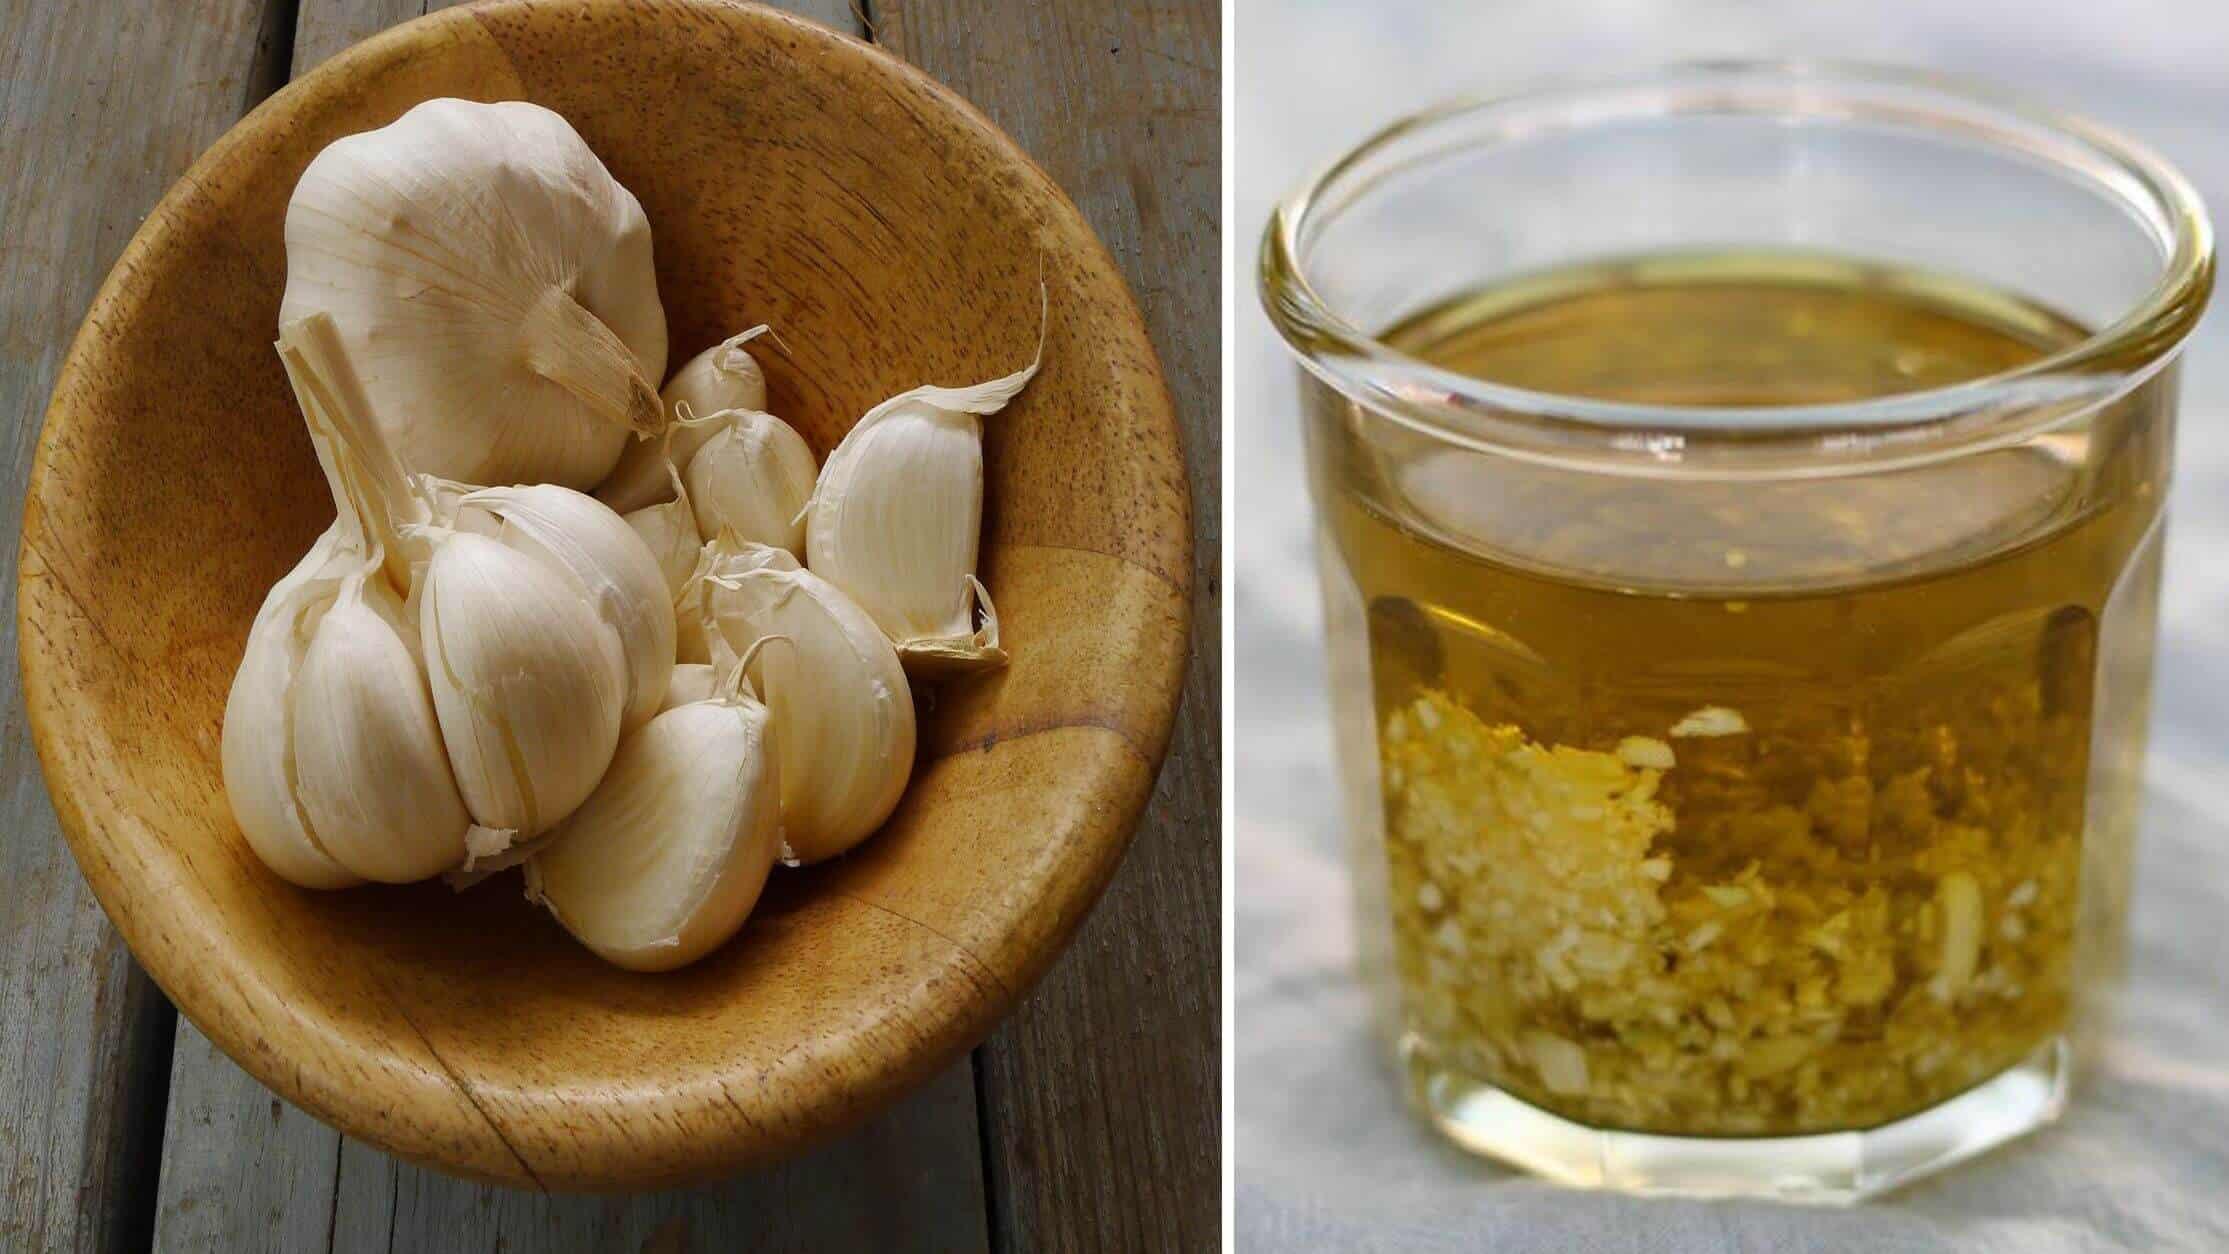 How to make antibiotic garlic tincture pw